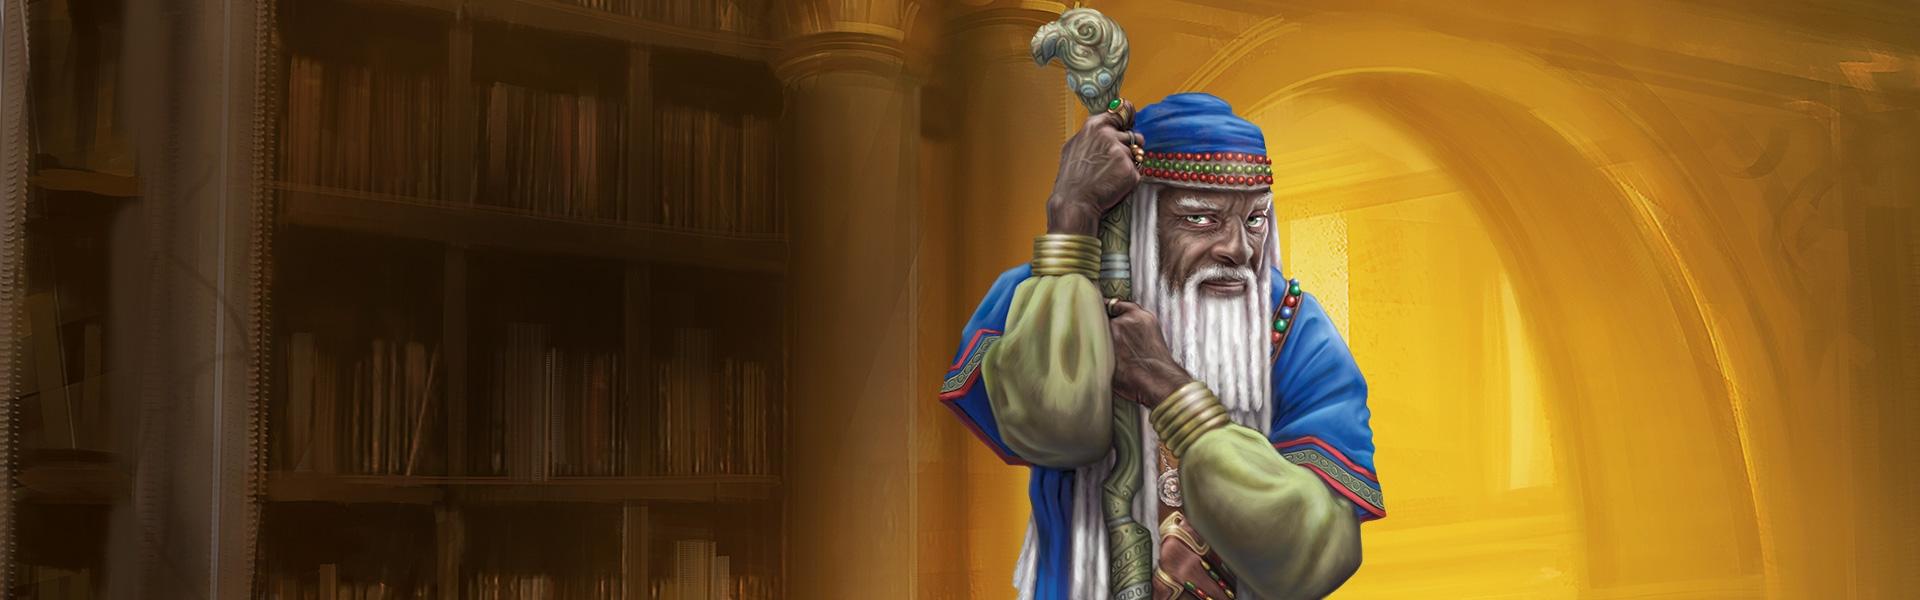 classes_wizard_header